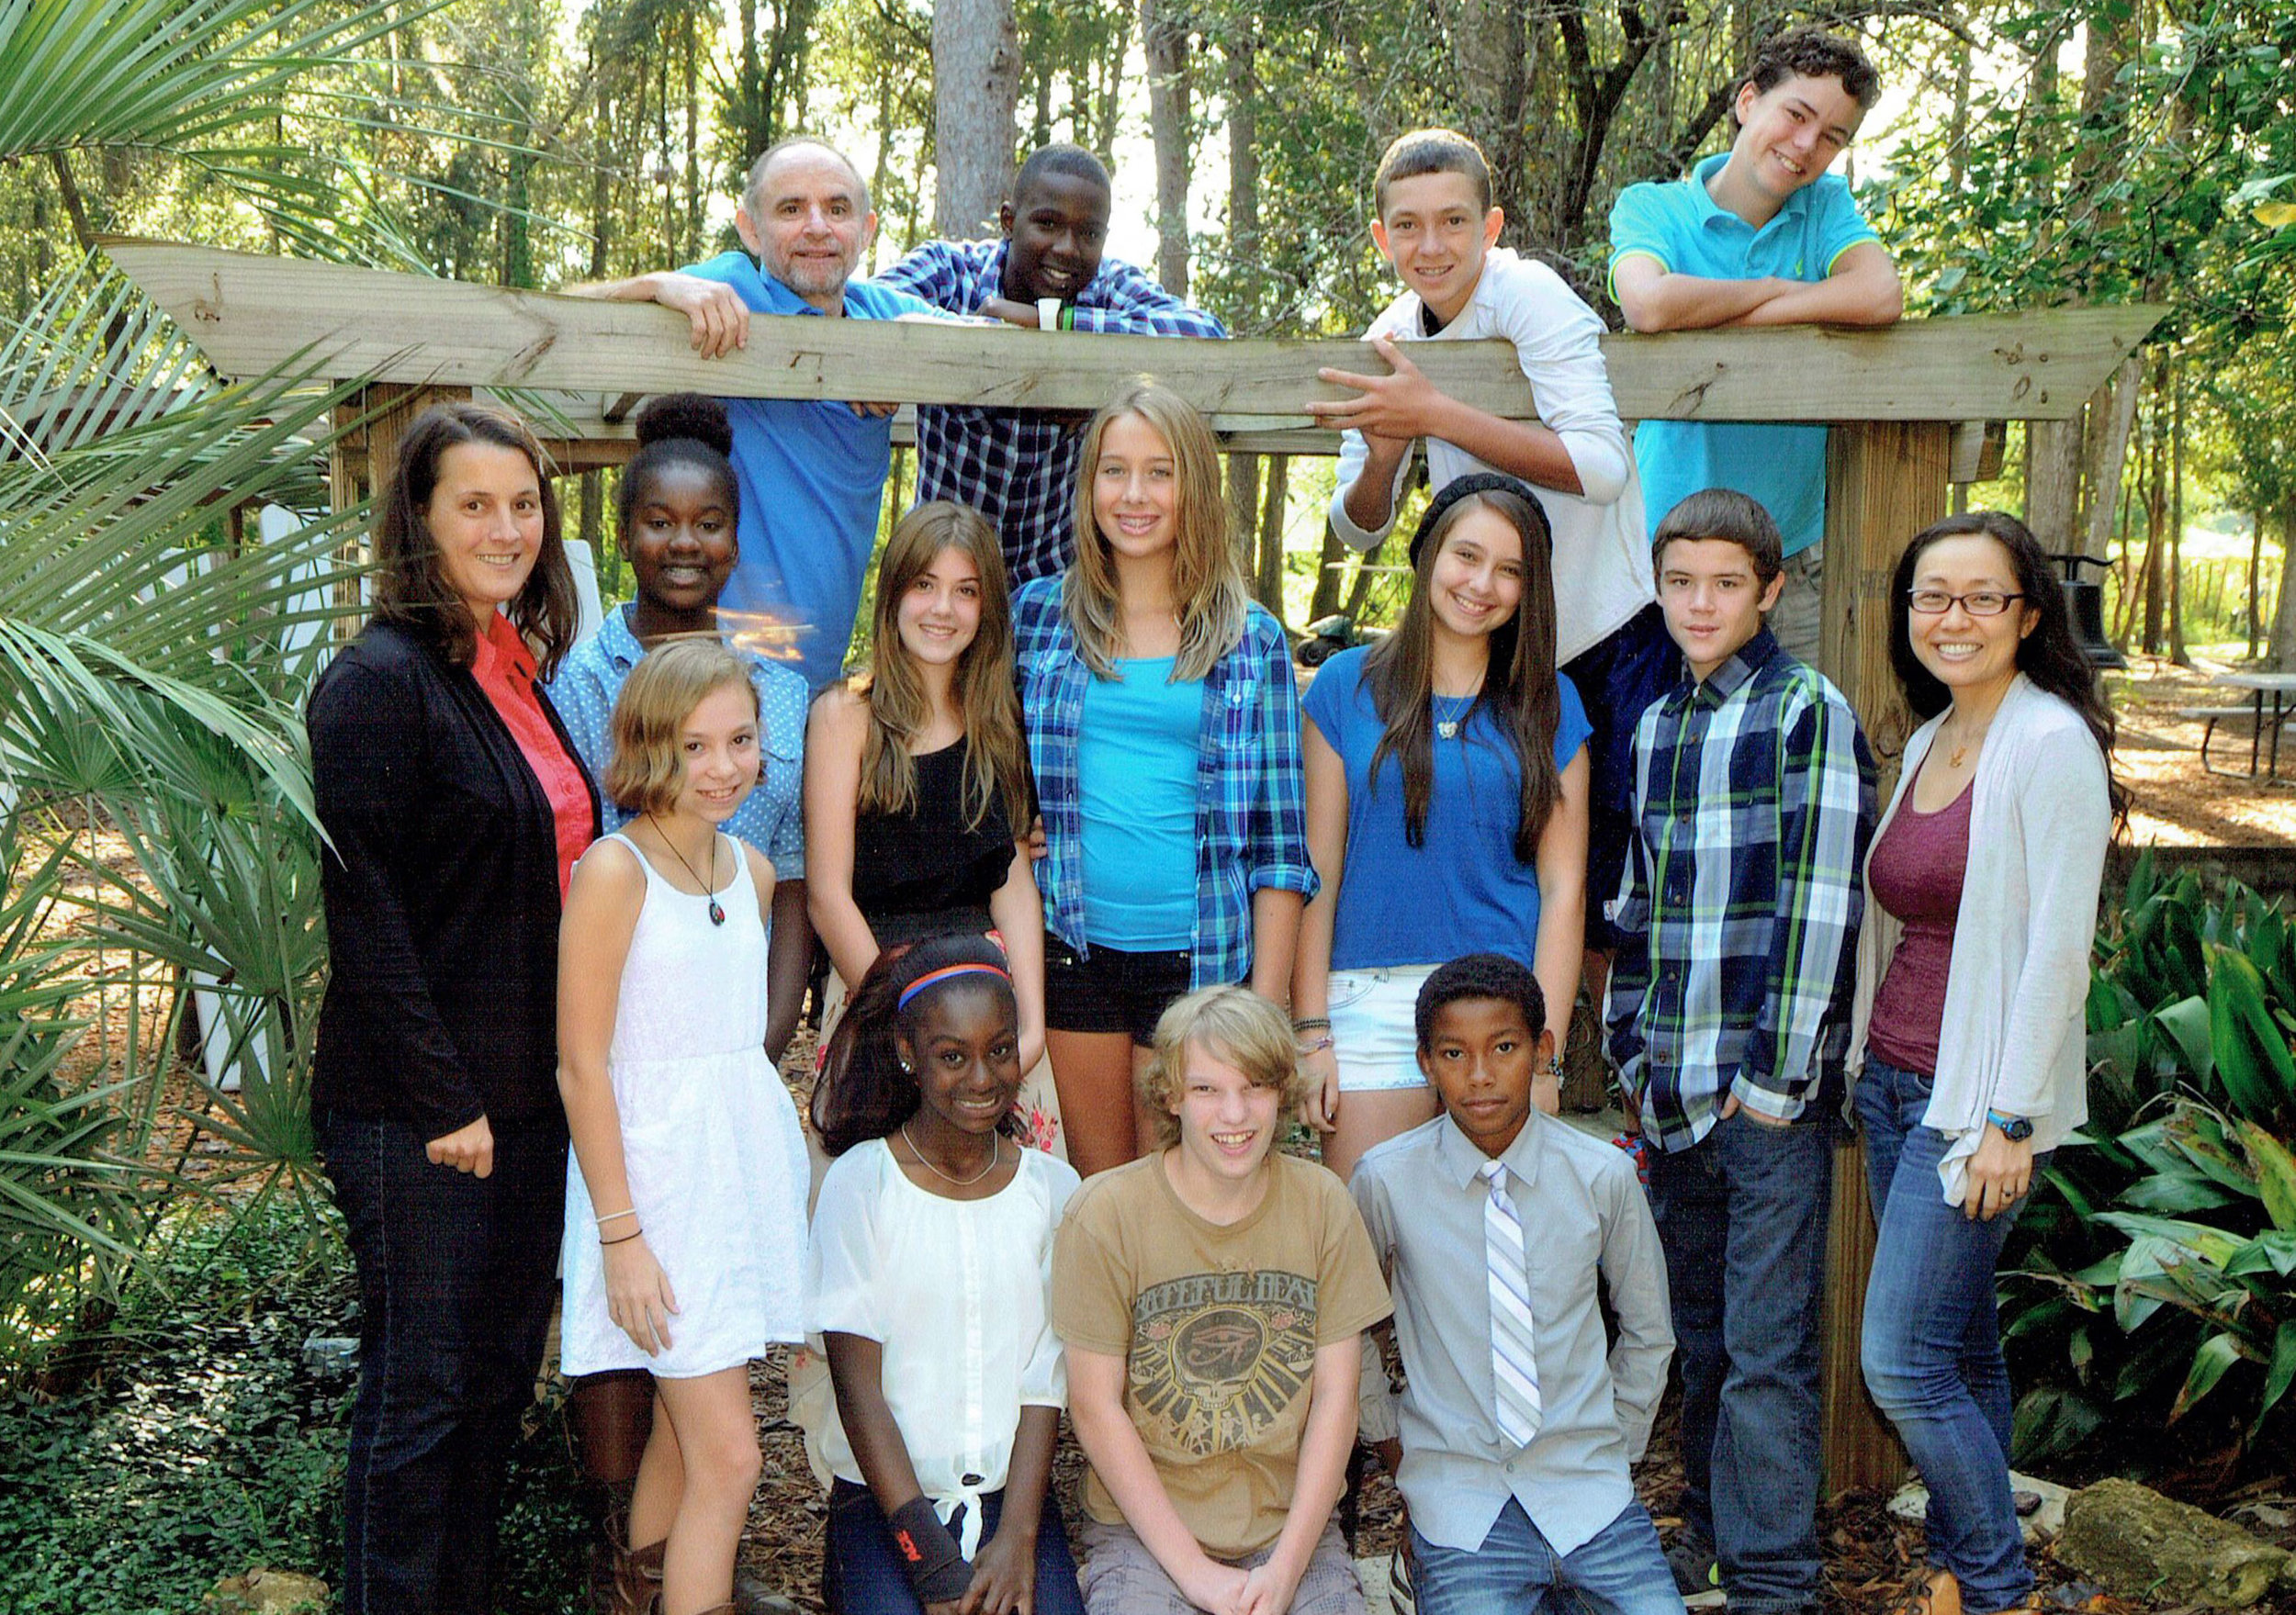 8th grade class pic '13-'14.jpg